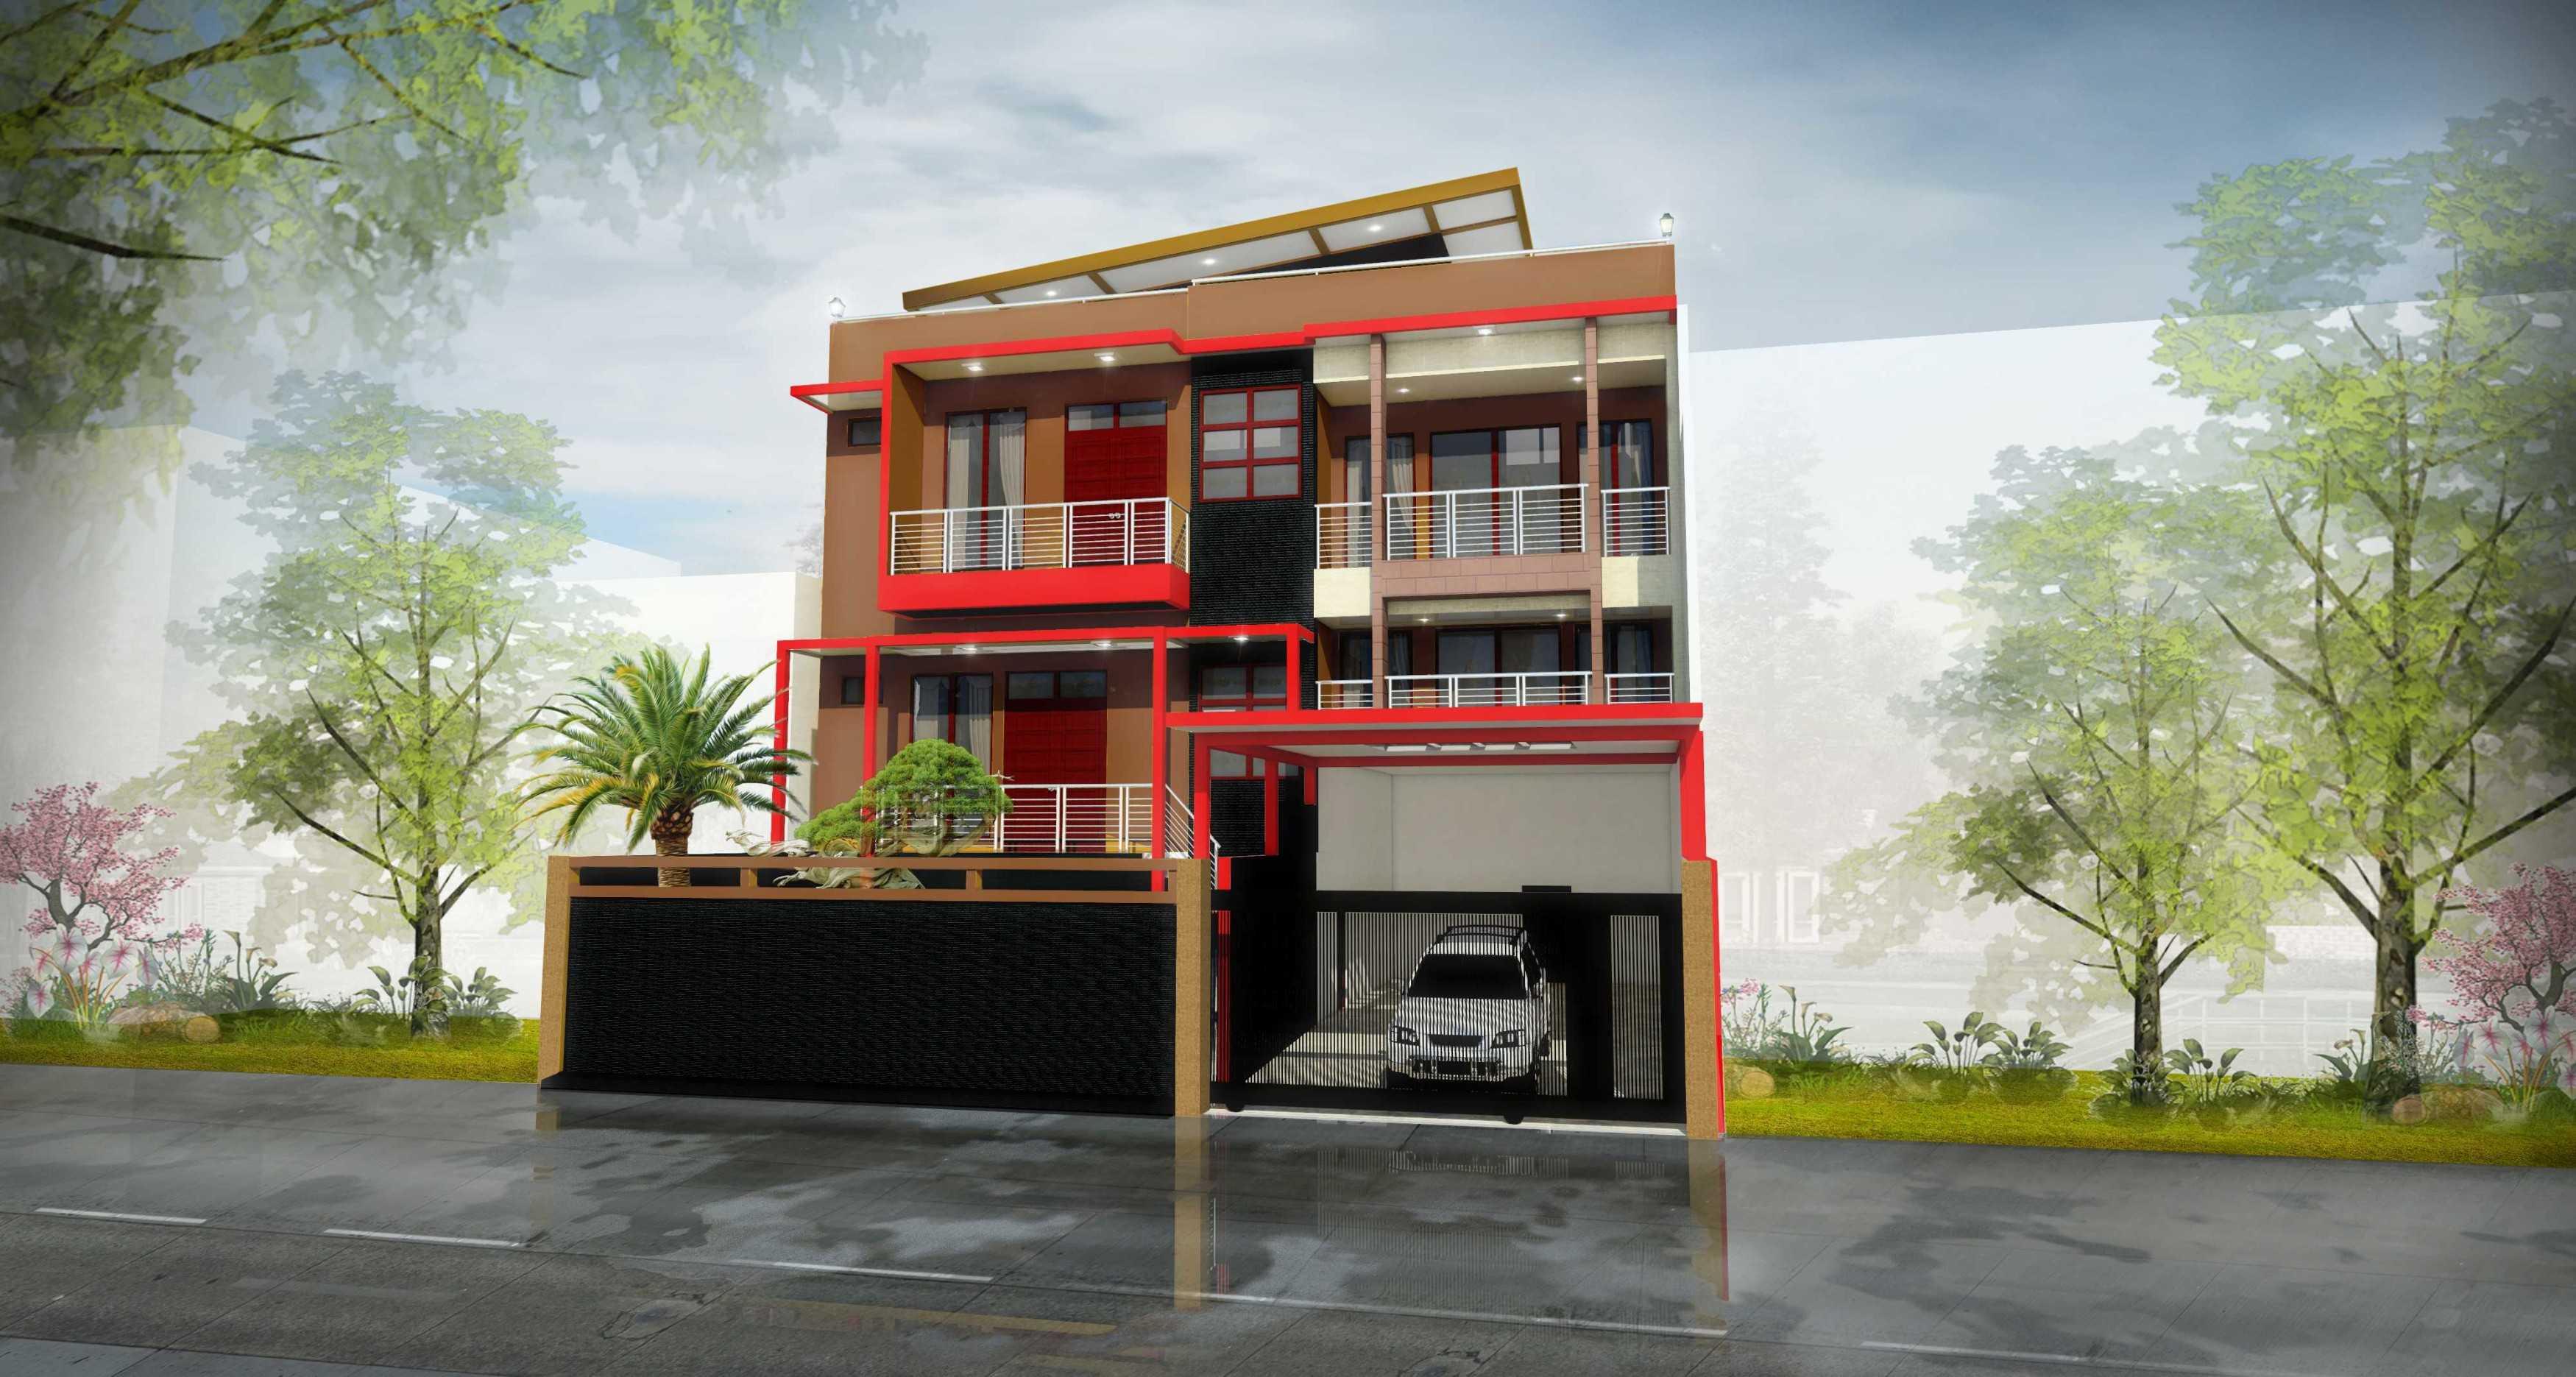 Albert Junior Ng House Jakarta, Daerah Khusus Ibukota Jakarta, Indonesia Jakarta, Daerah Khusus Ibukota Jakarta, Indonesia Albert-Junior-Ng-House   83396